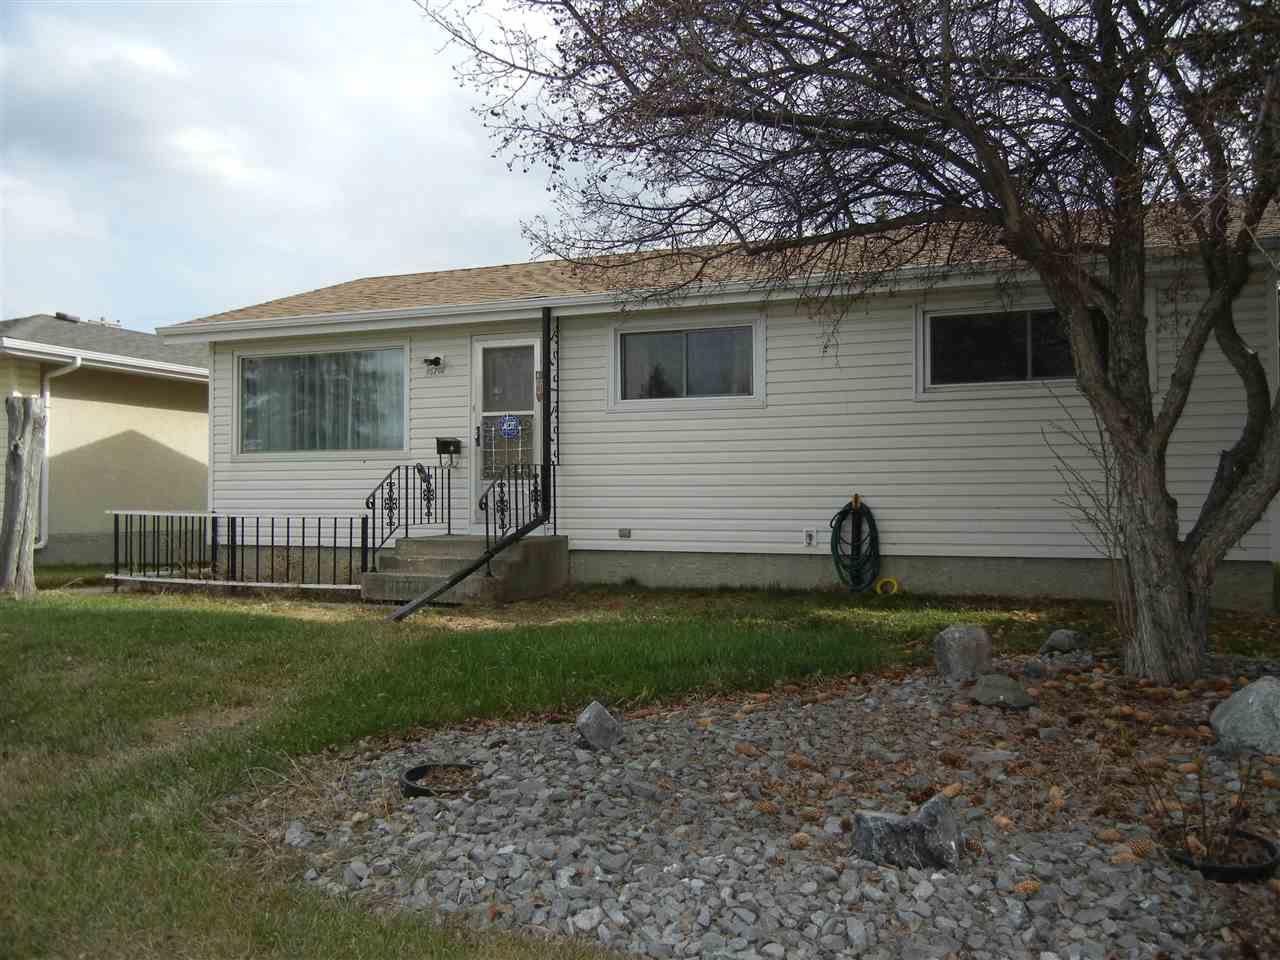 Main Photo: 16701 94 Avenue in Edmonton: Zone 22 House for sale : MLS®# E4153996